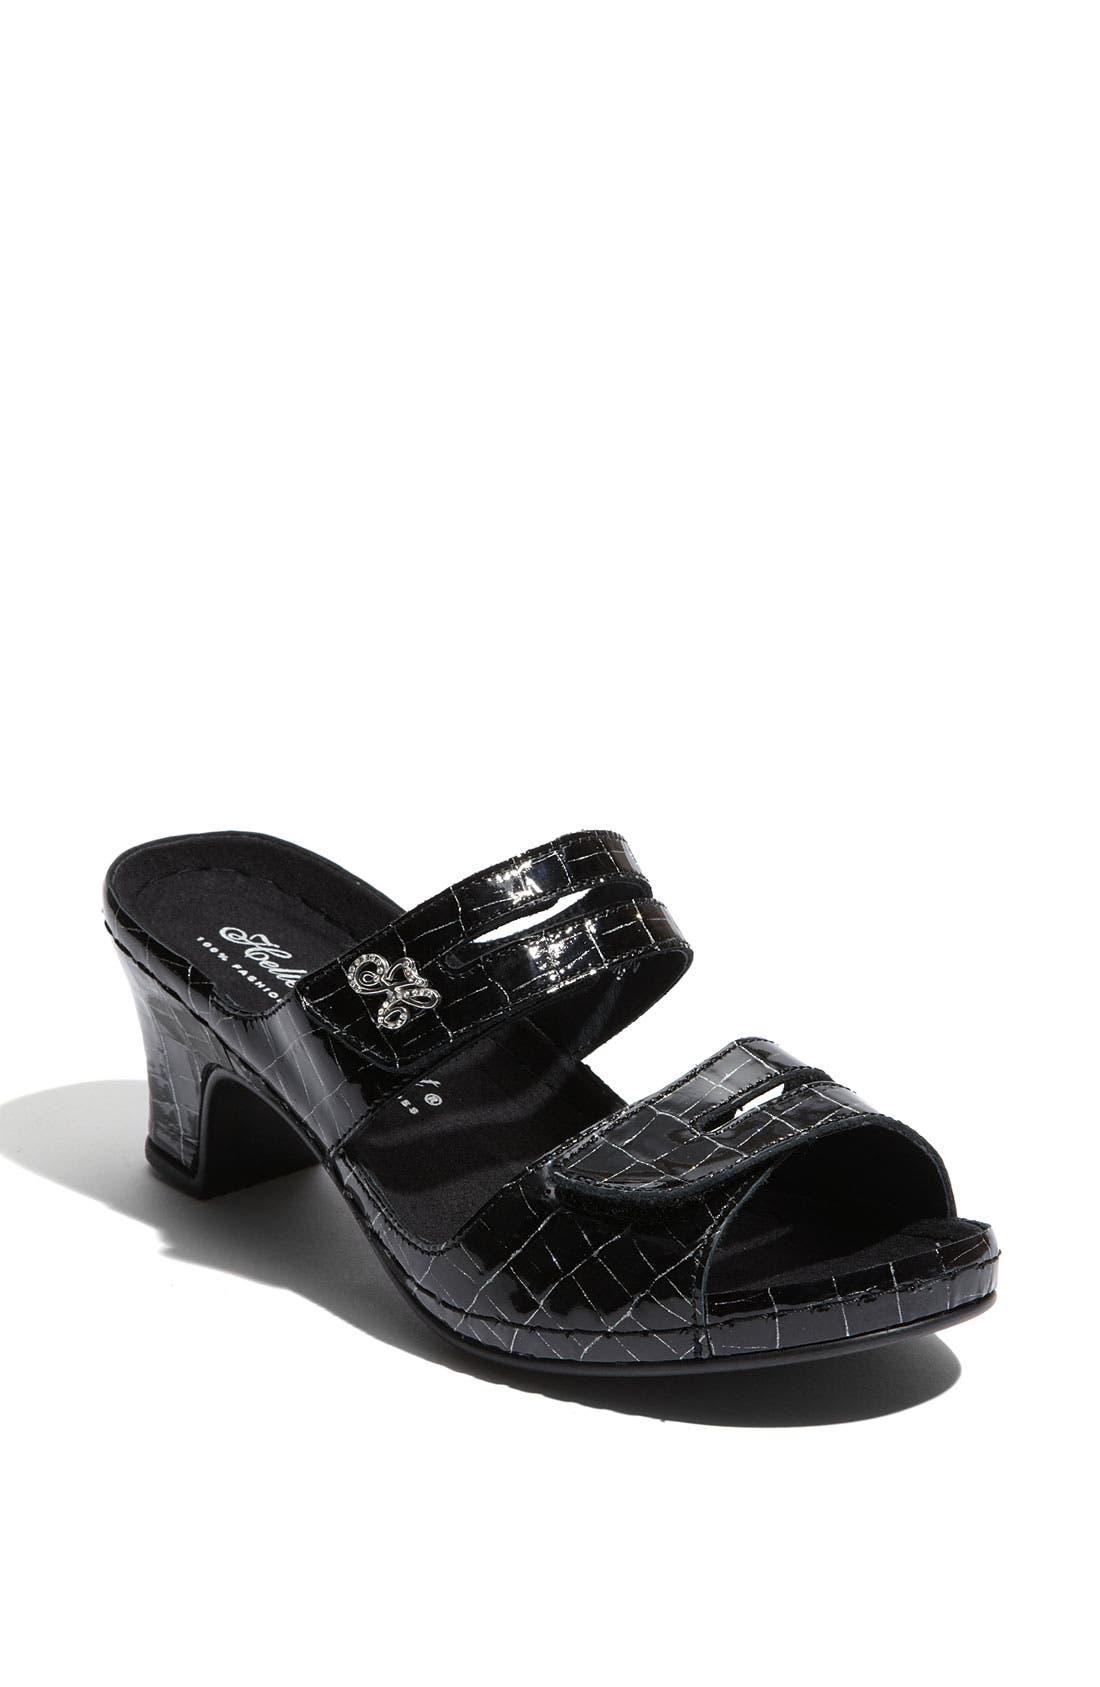 Alternate Image 1 Selected - Helle Comfort® 'Dena' Sandal